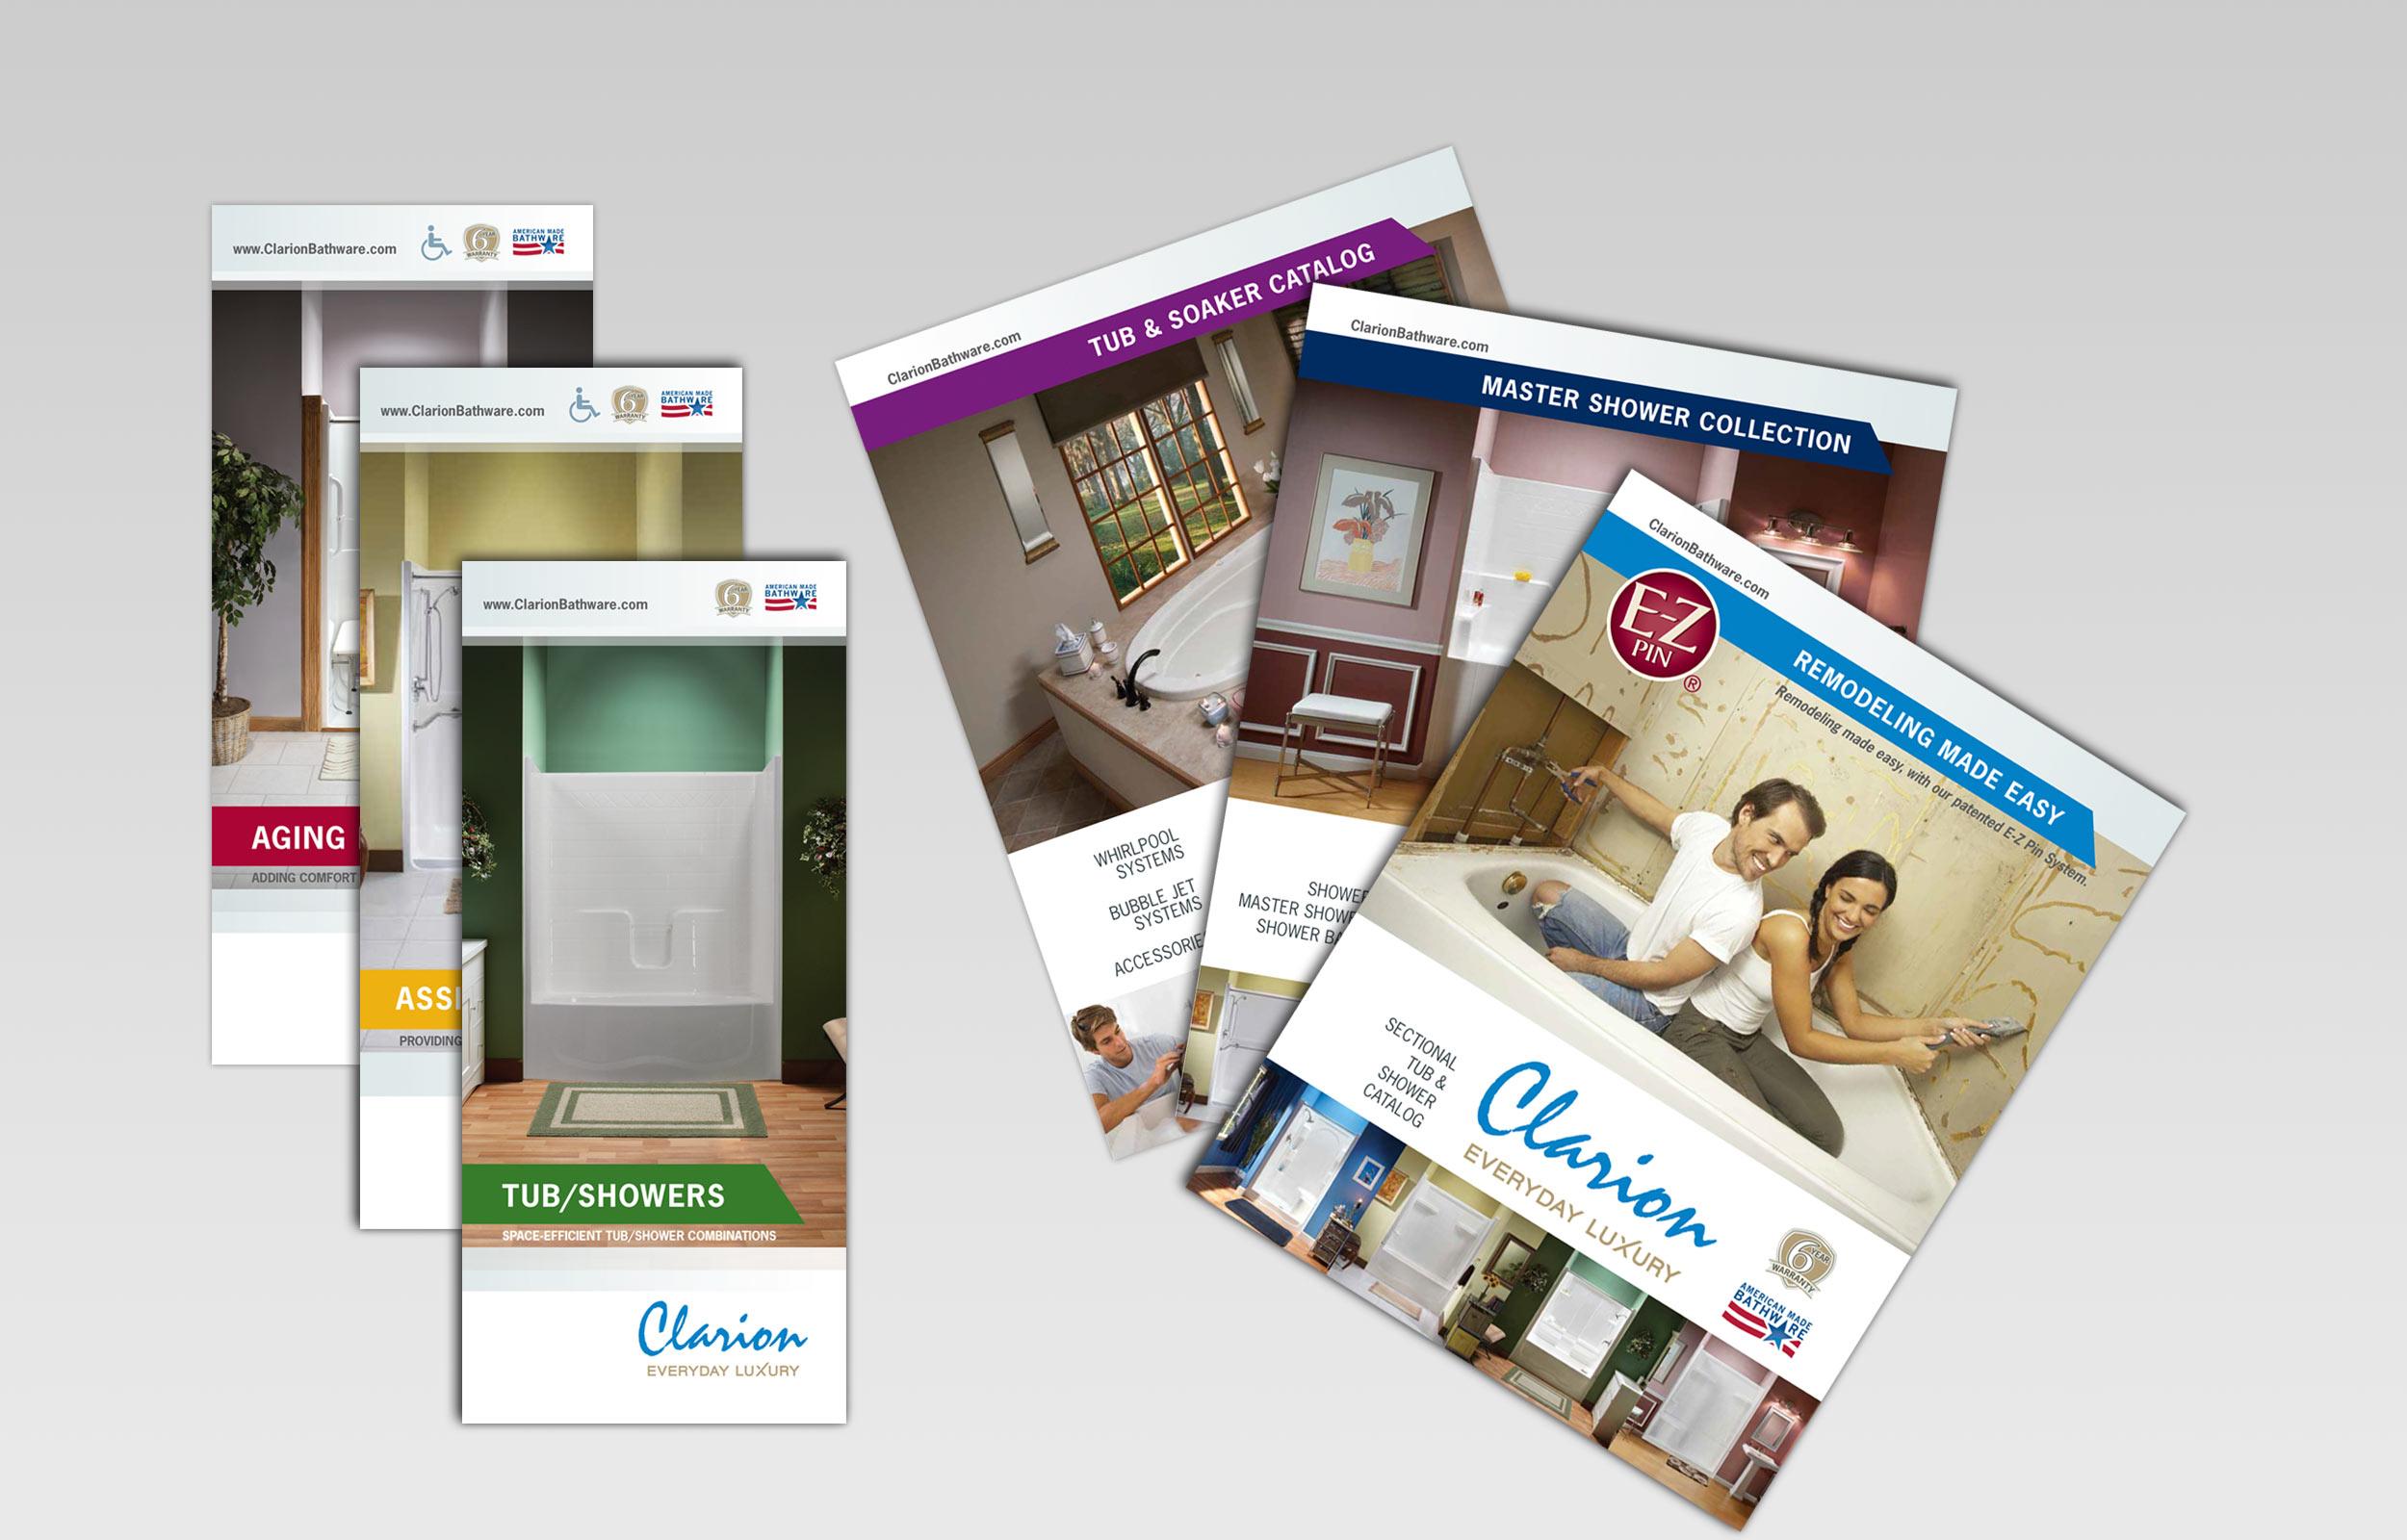 http://i2.wp.com/papaadvertising.com/wp-content/uploads/2015/10/CBW-Brochure.jpg?fit=2500%2C1600